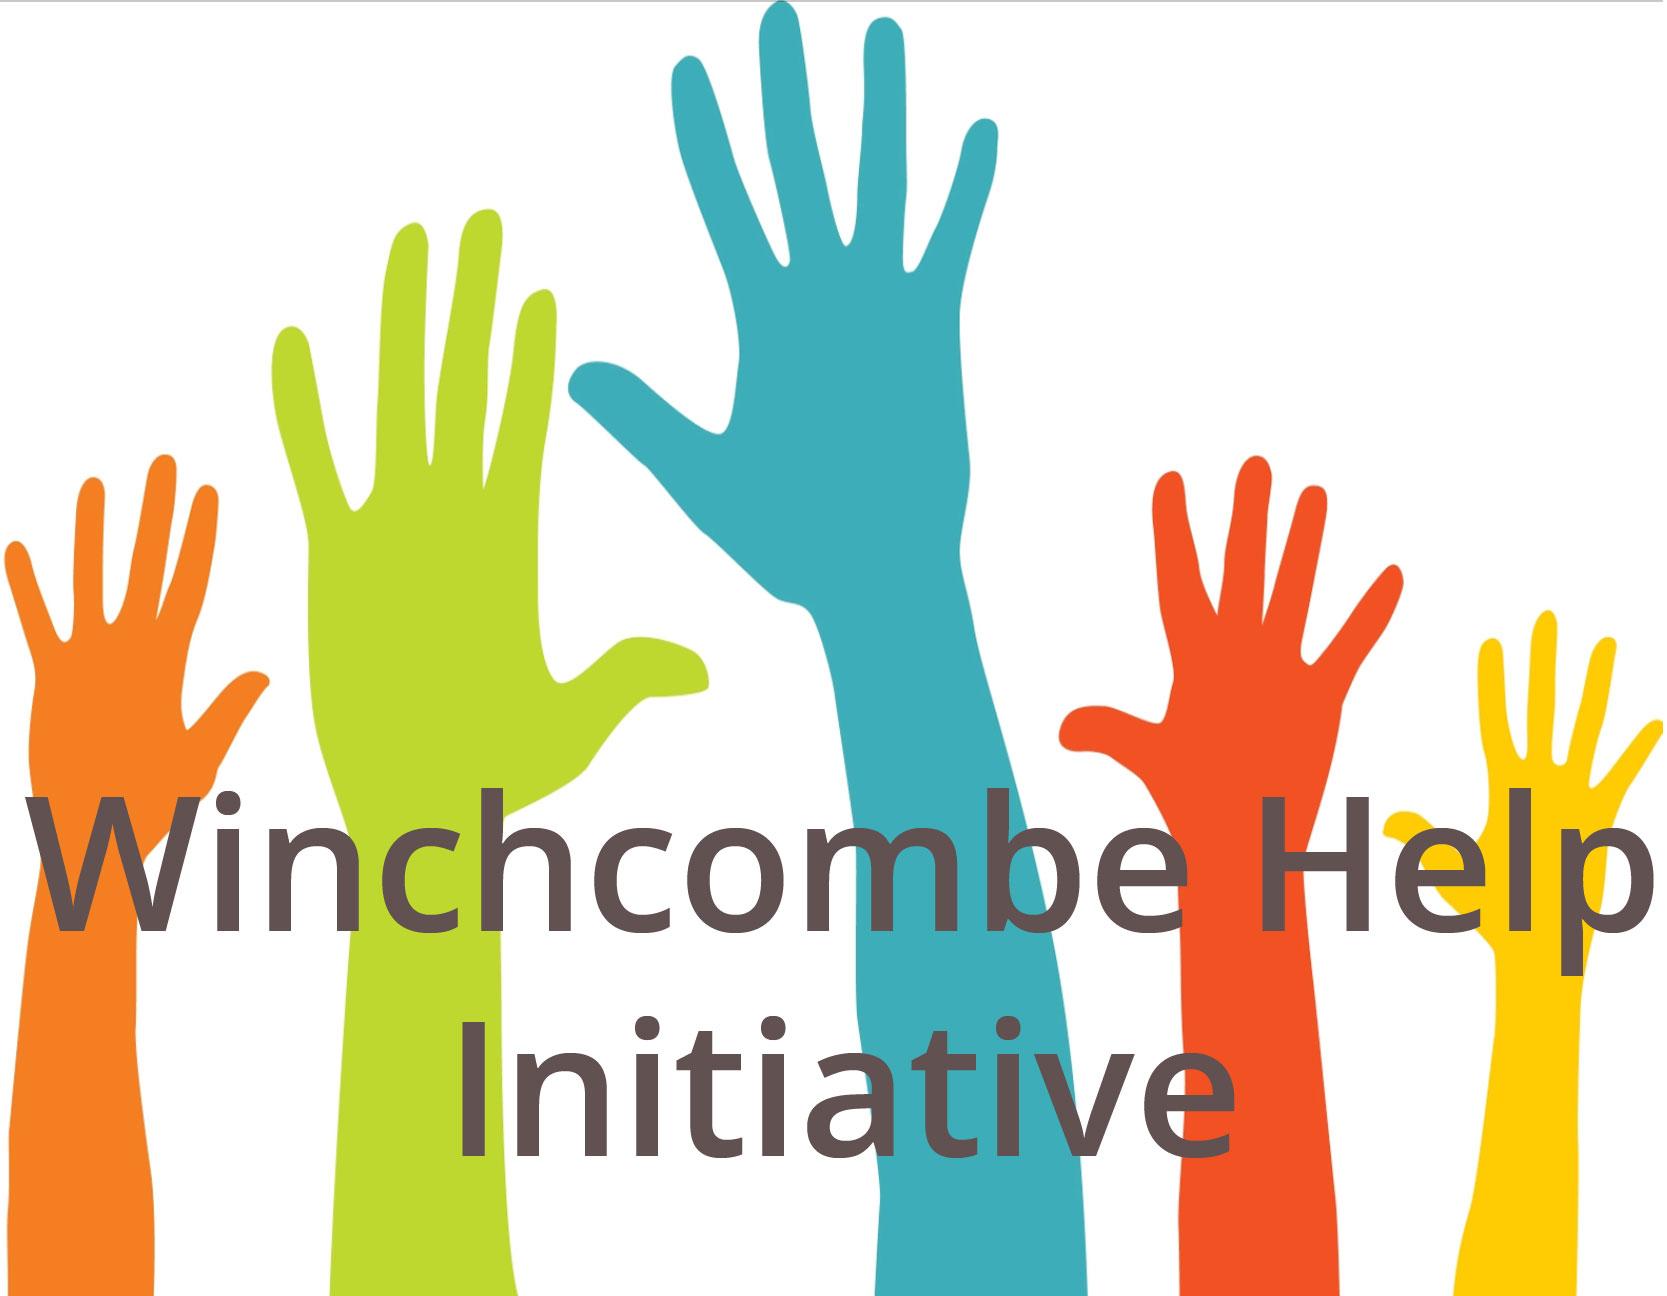 Winchcombe Help Initiative